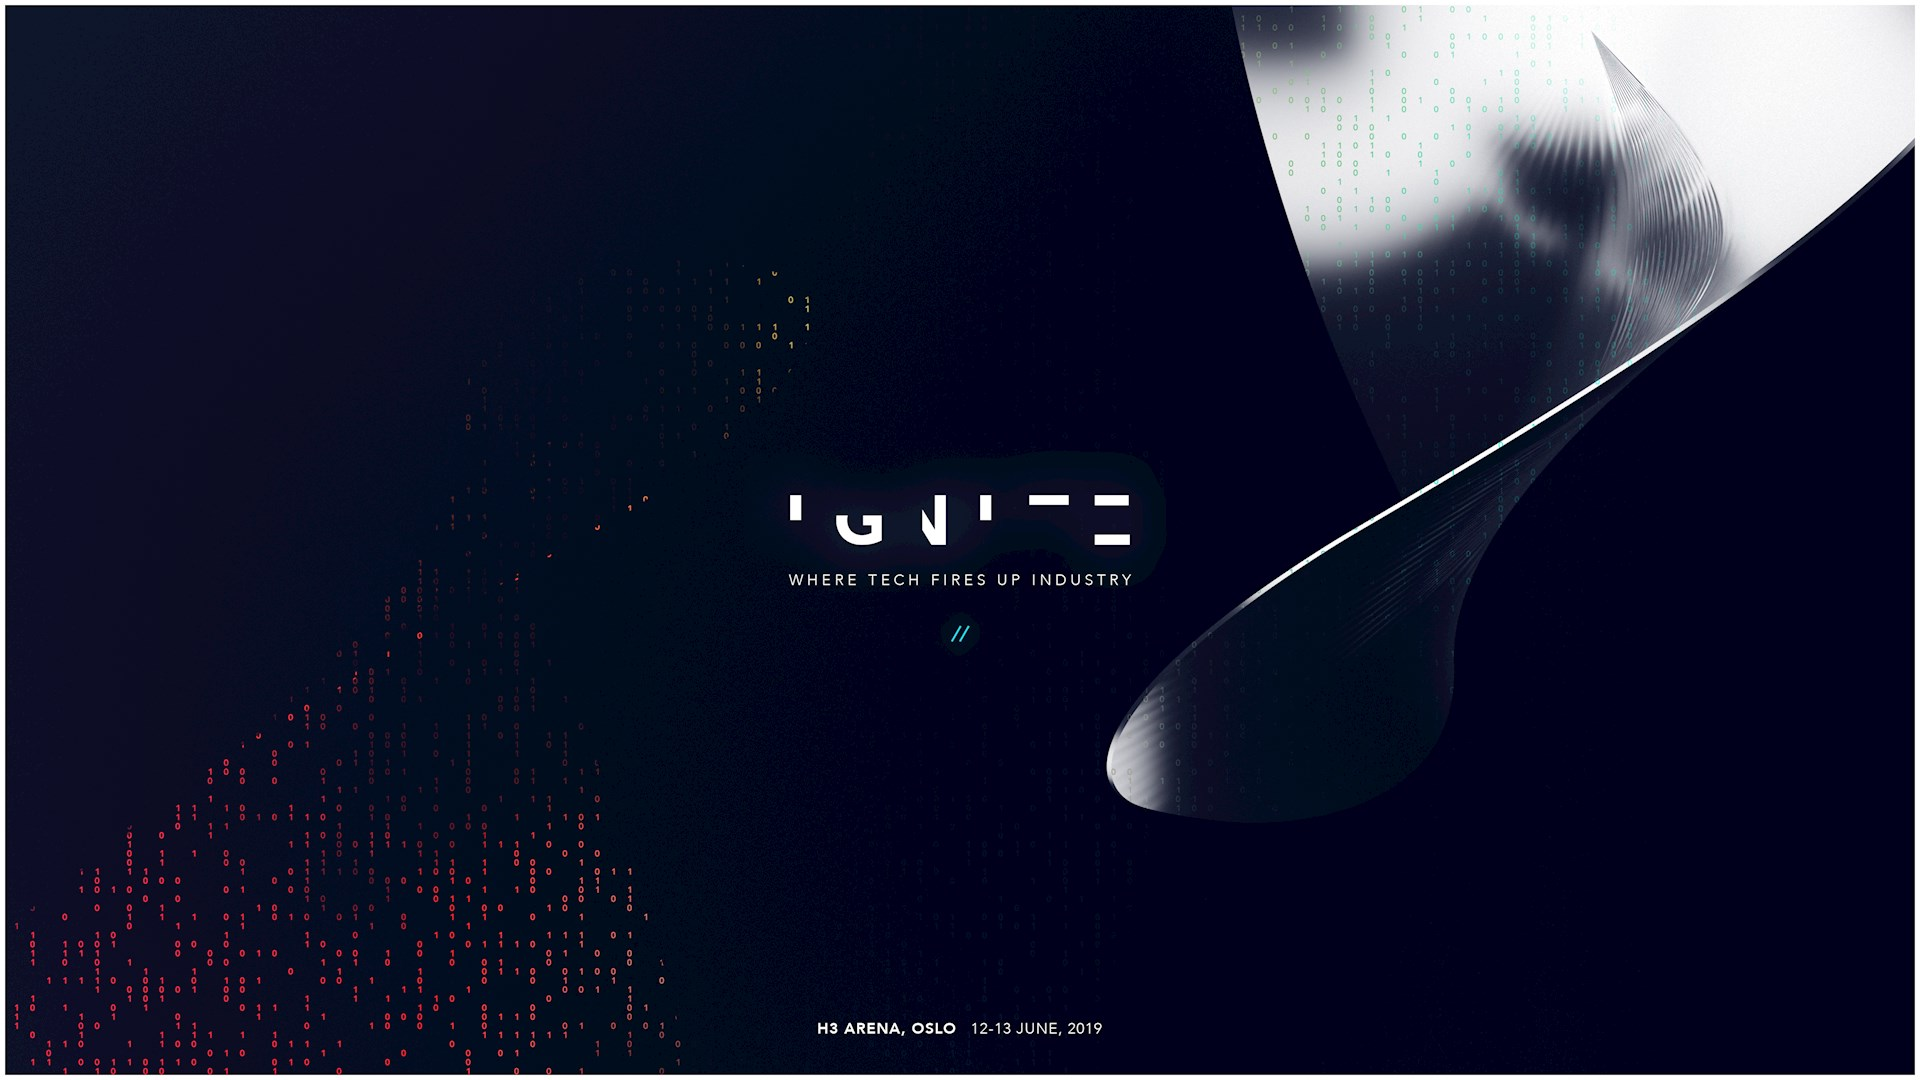 poster-ignite-1